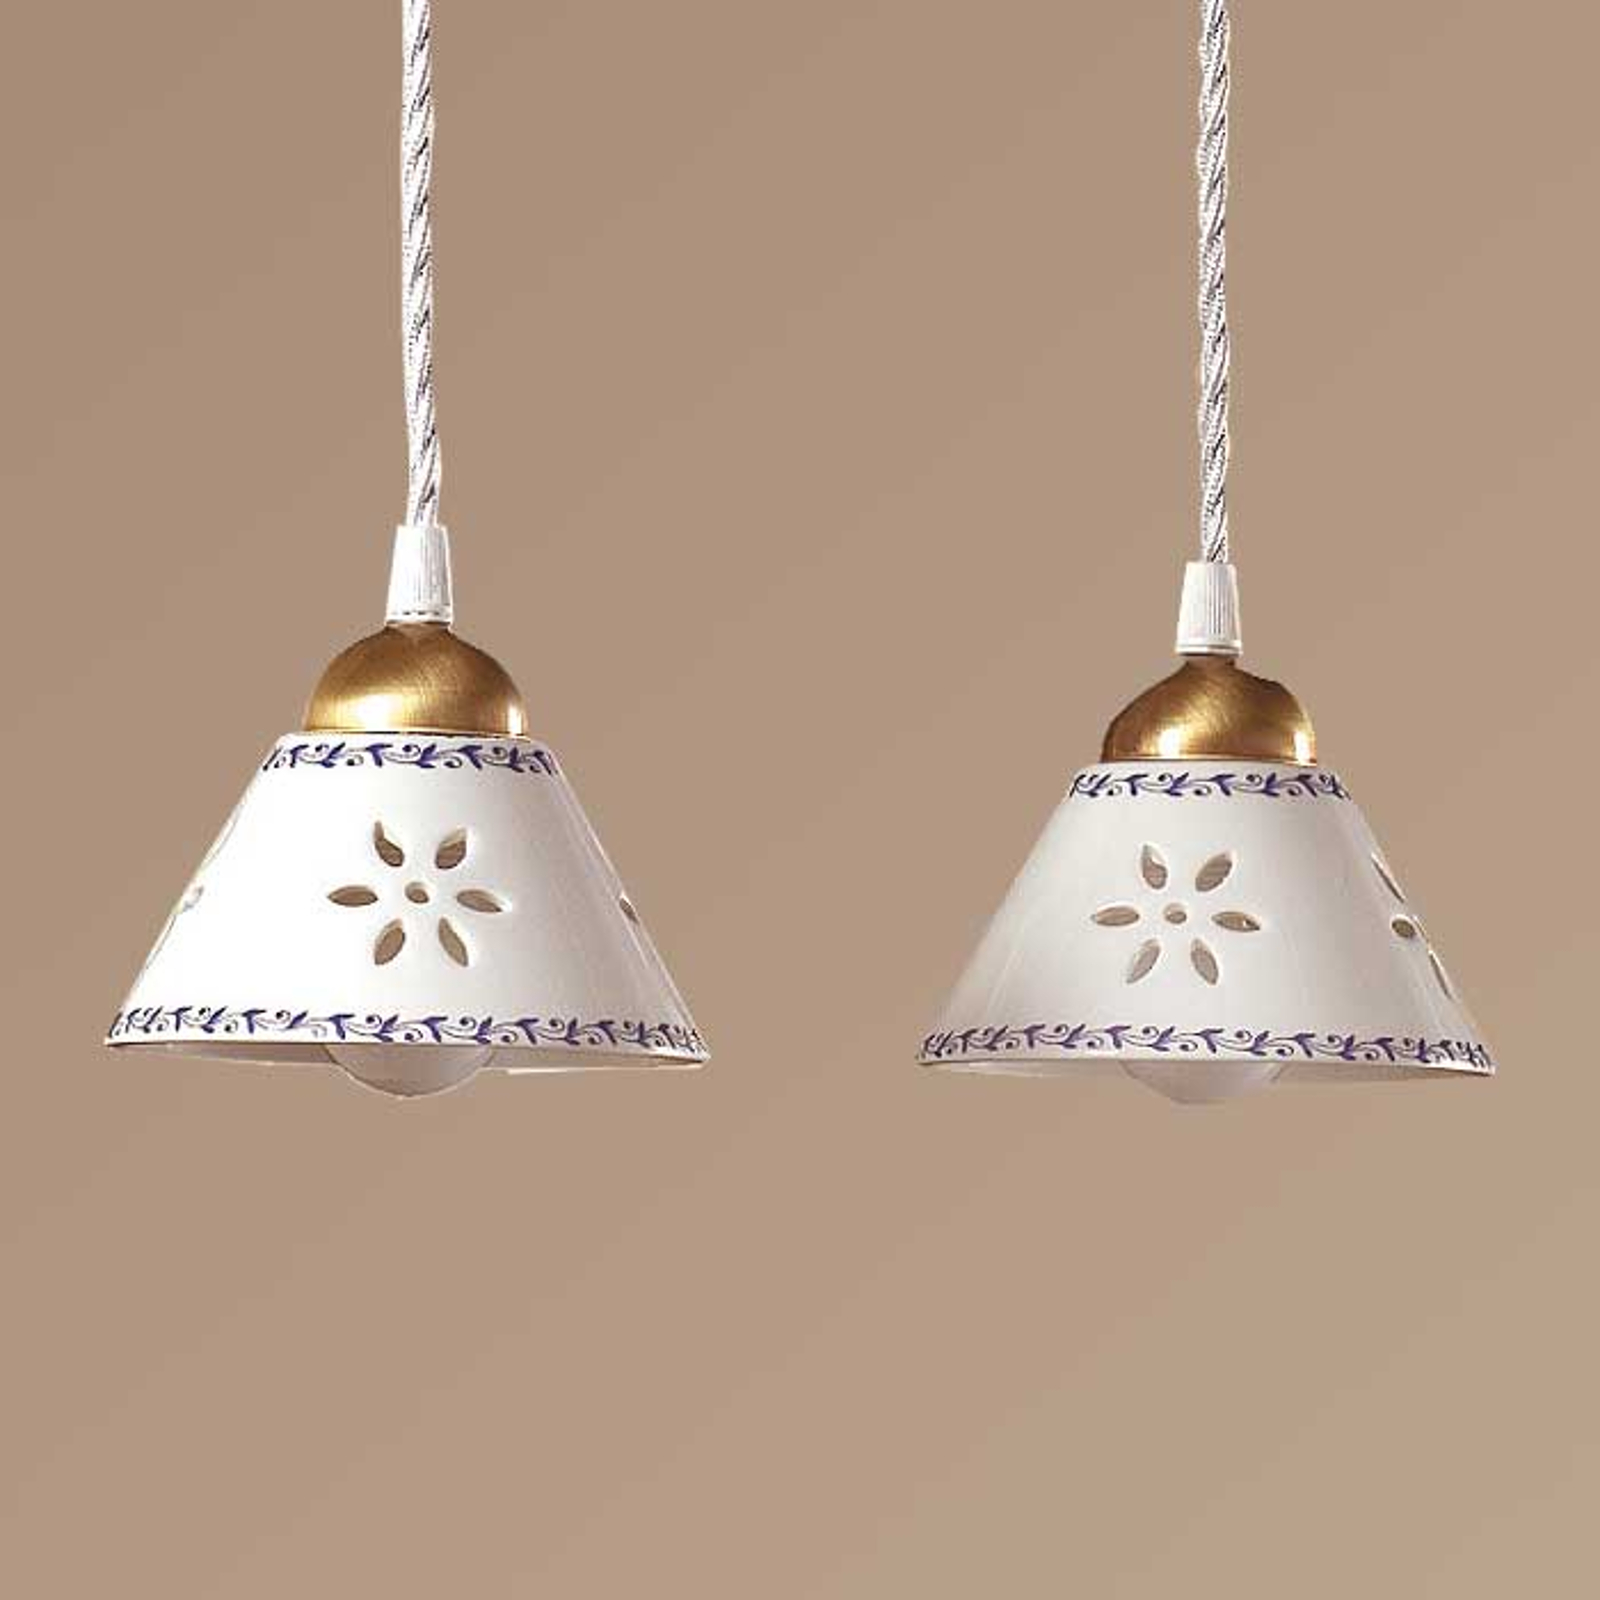 Lámpara colgante de 2 luces Nonna, cerámica blanca